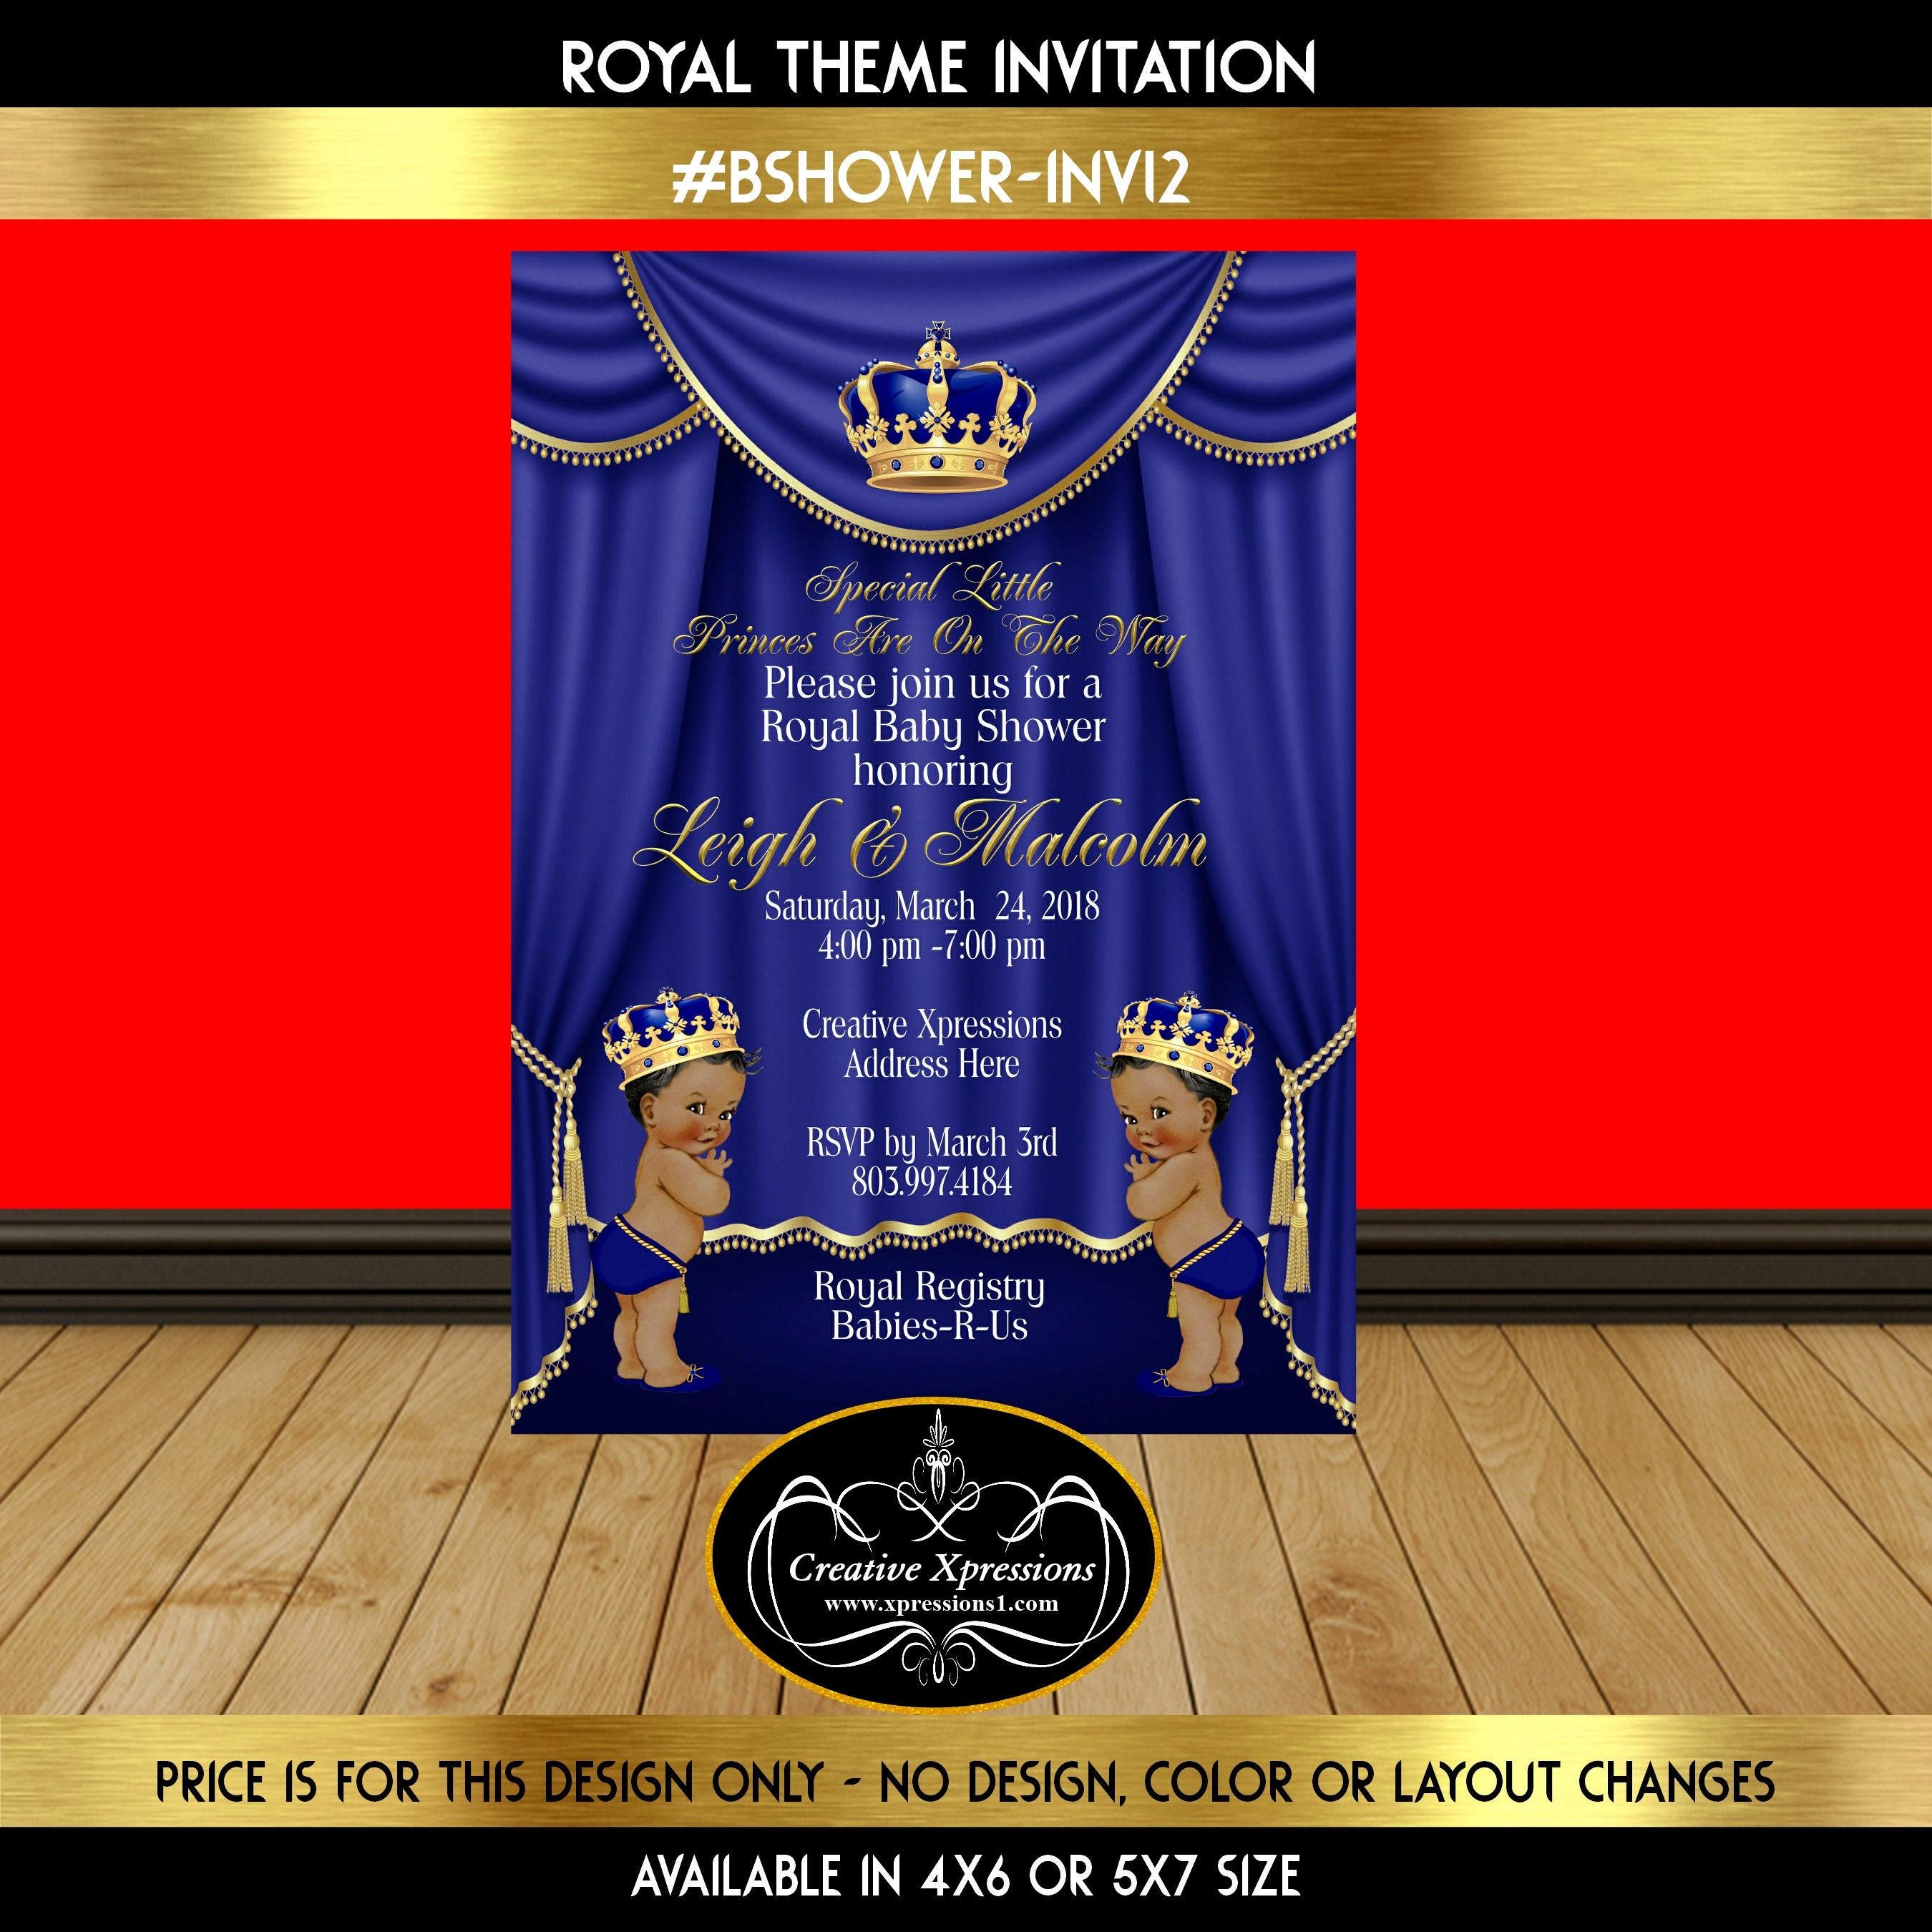 Twin Royal Princes Theme Invitation Blue and Gold Birthday | Etsy